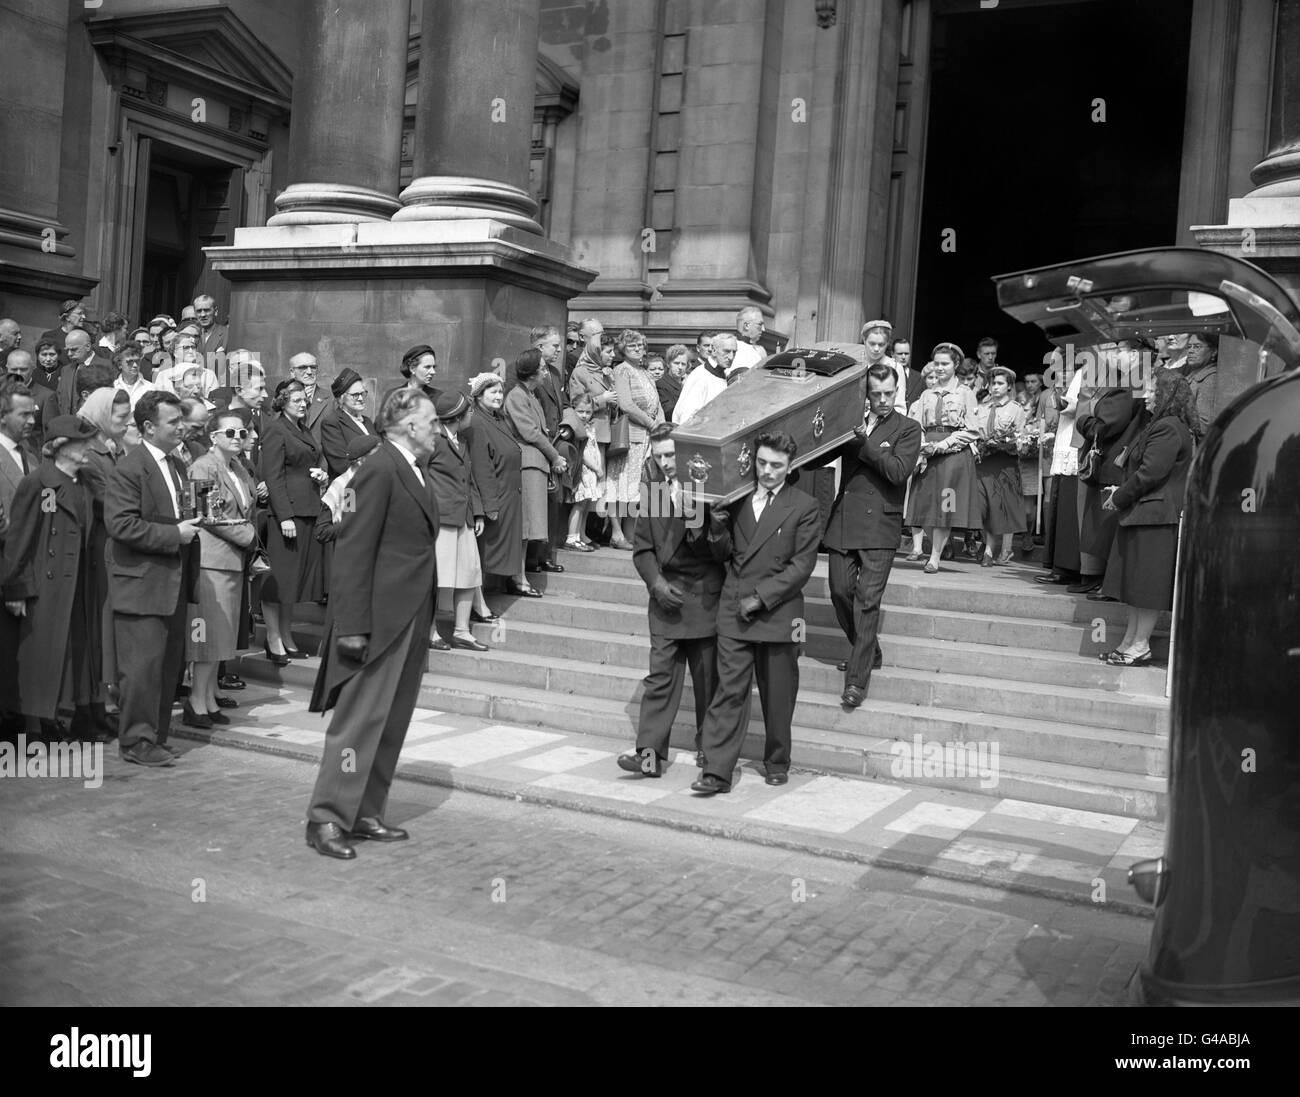 Crime - Countess Teresa Lubienska Funeral - Brompton Oratory, London Stock Photo